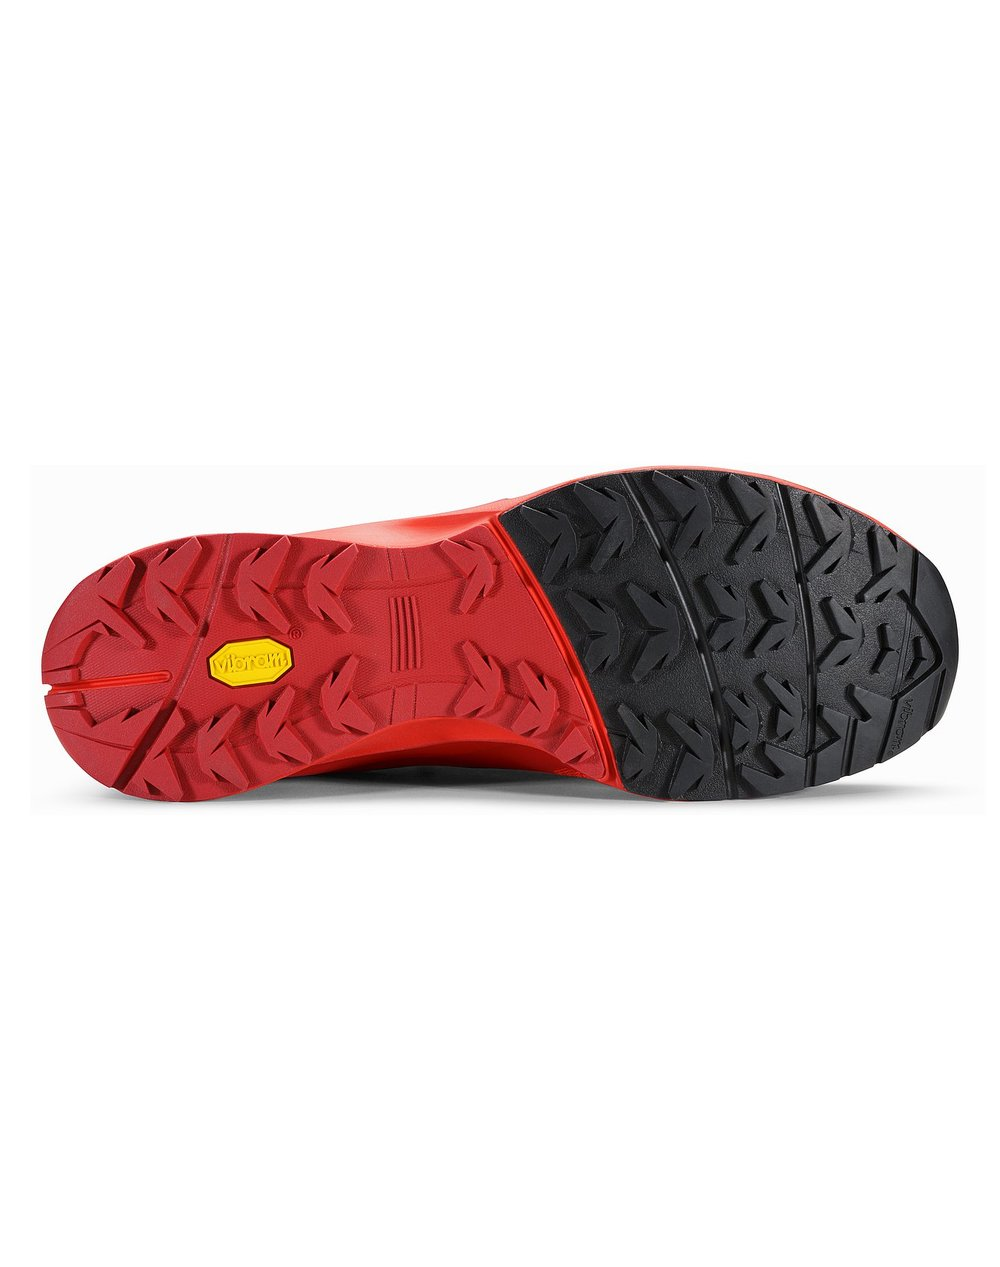 Norvan-VT-GTX-Shoe-Maple-Black-Sole.jpg